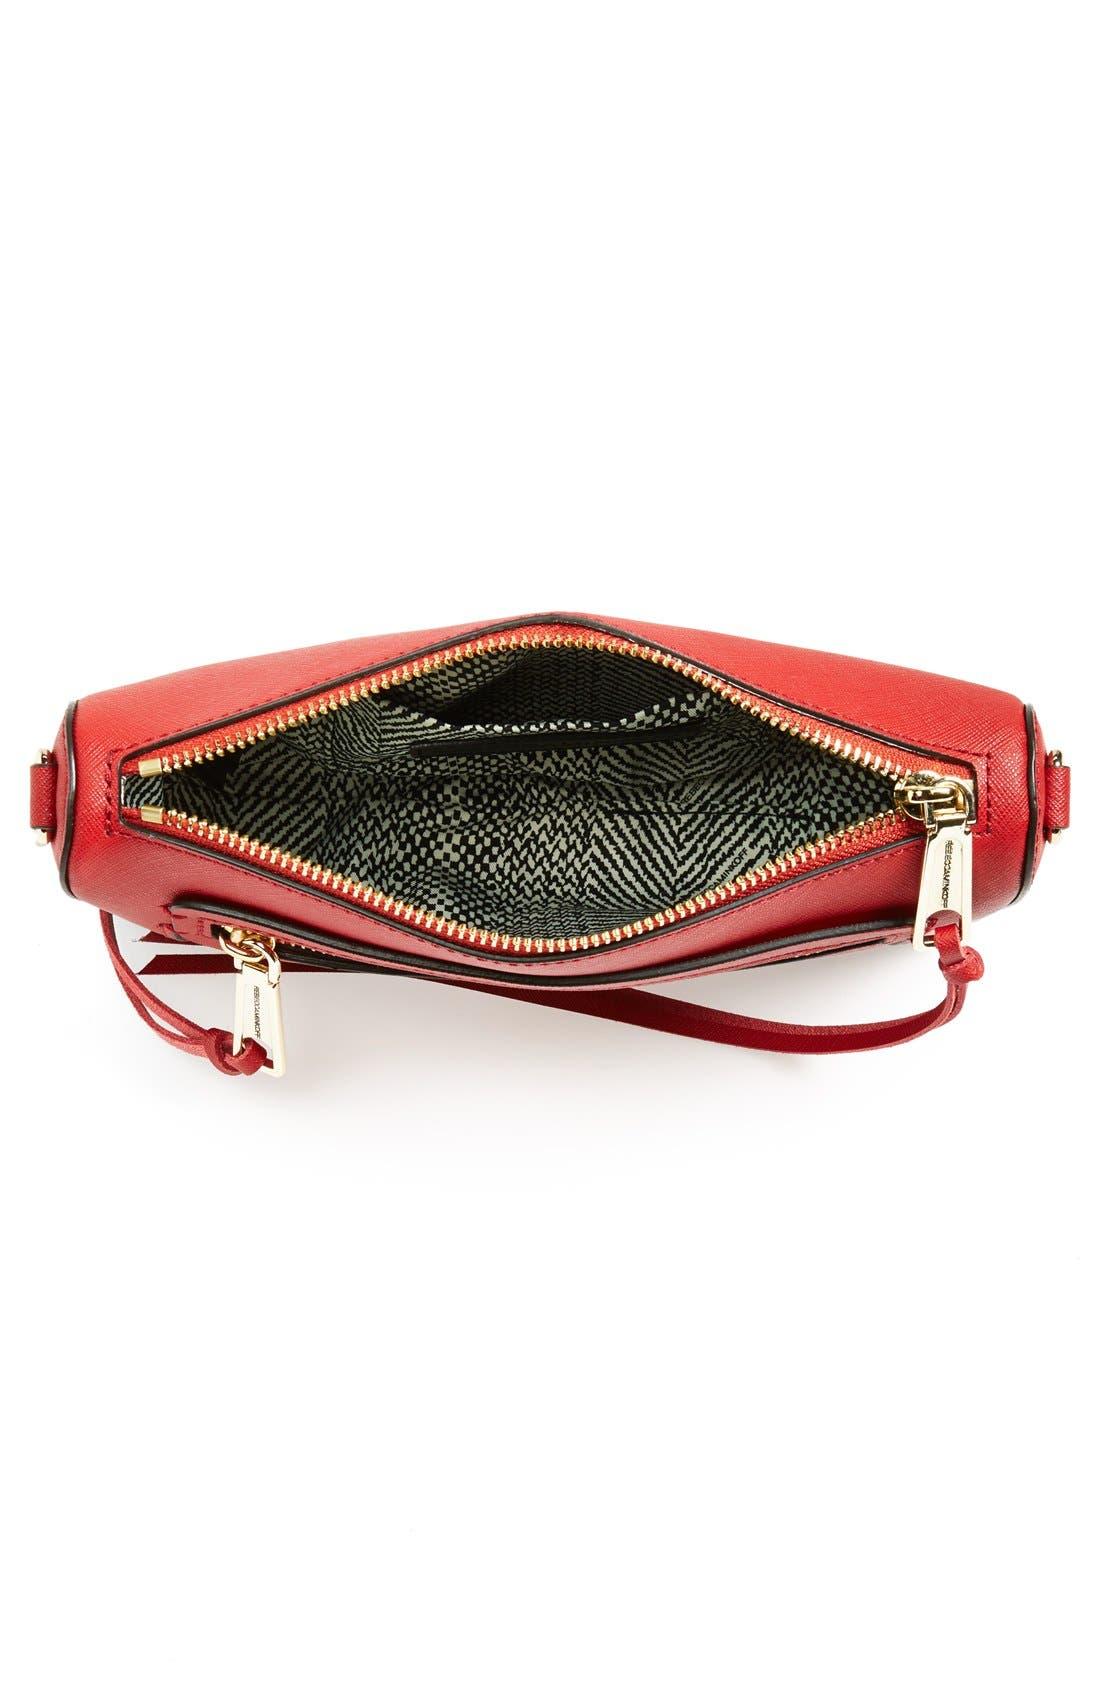 'Avery' Crossbody Bag,                             Alternate thumbnail 4, color,                             600